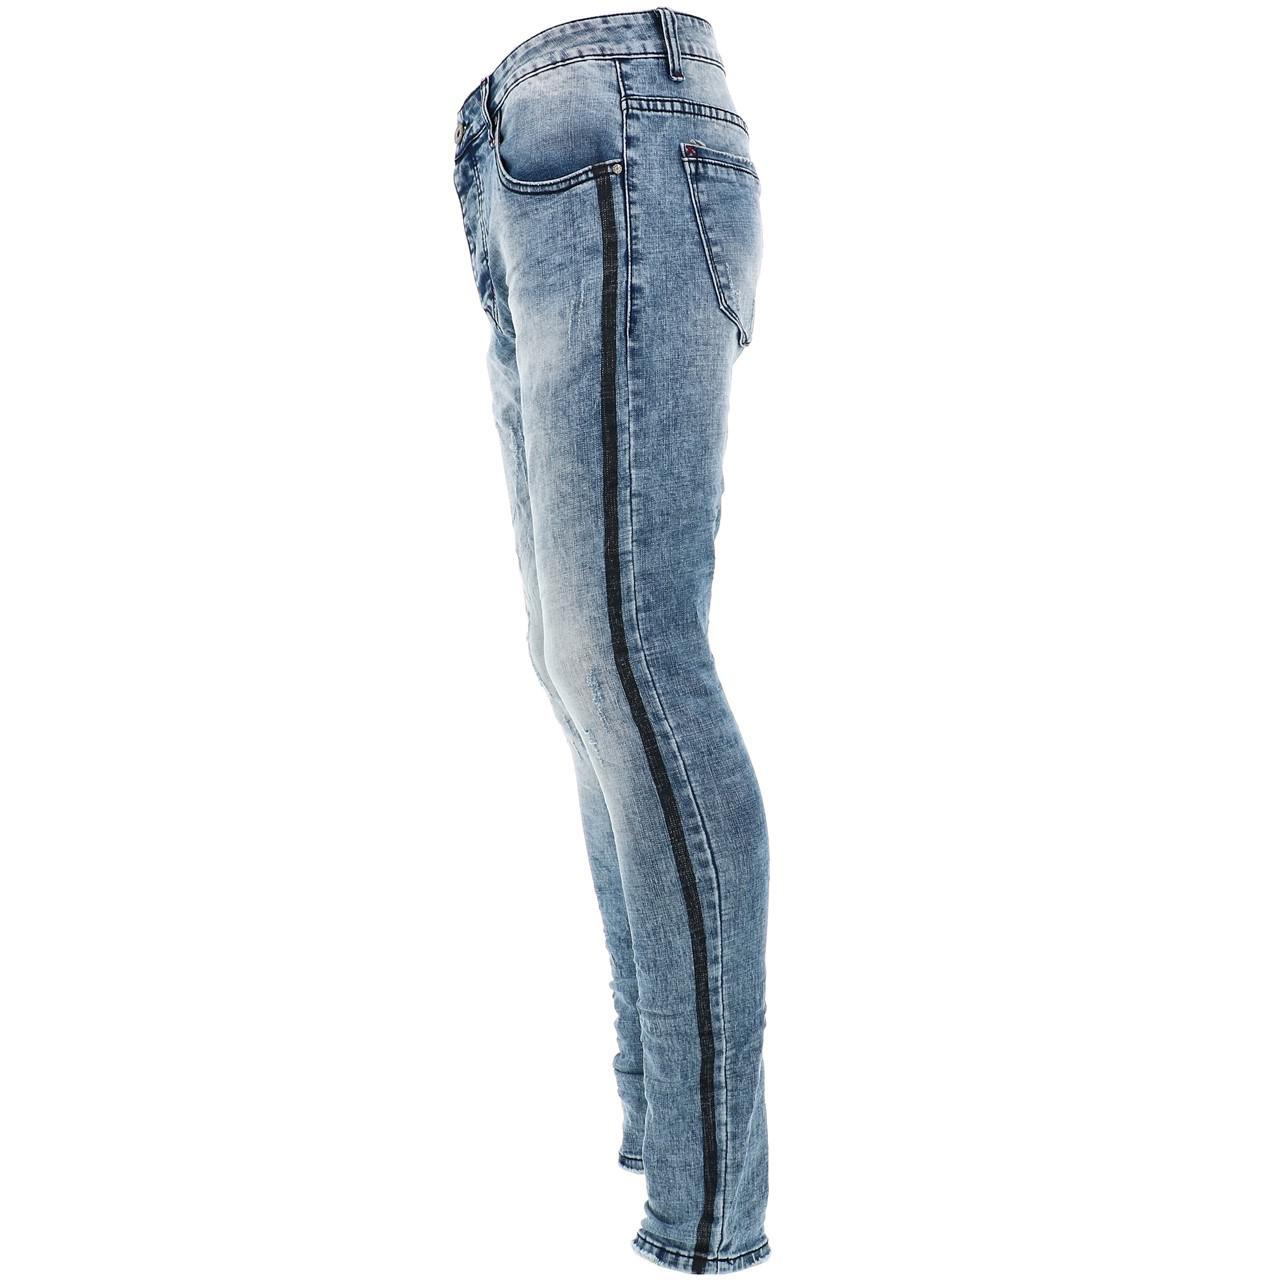 Jeans-Pants-Slim-Terance-Koll-Oscar-Denim-Jeans-Skinny-Blue-28526-New thumbnail 2